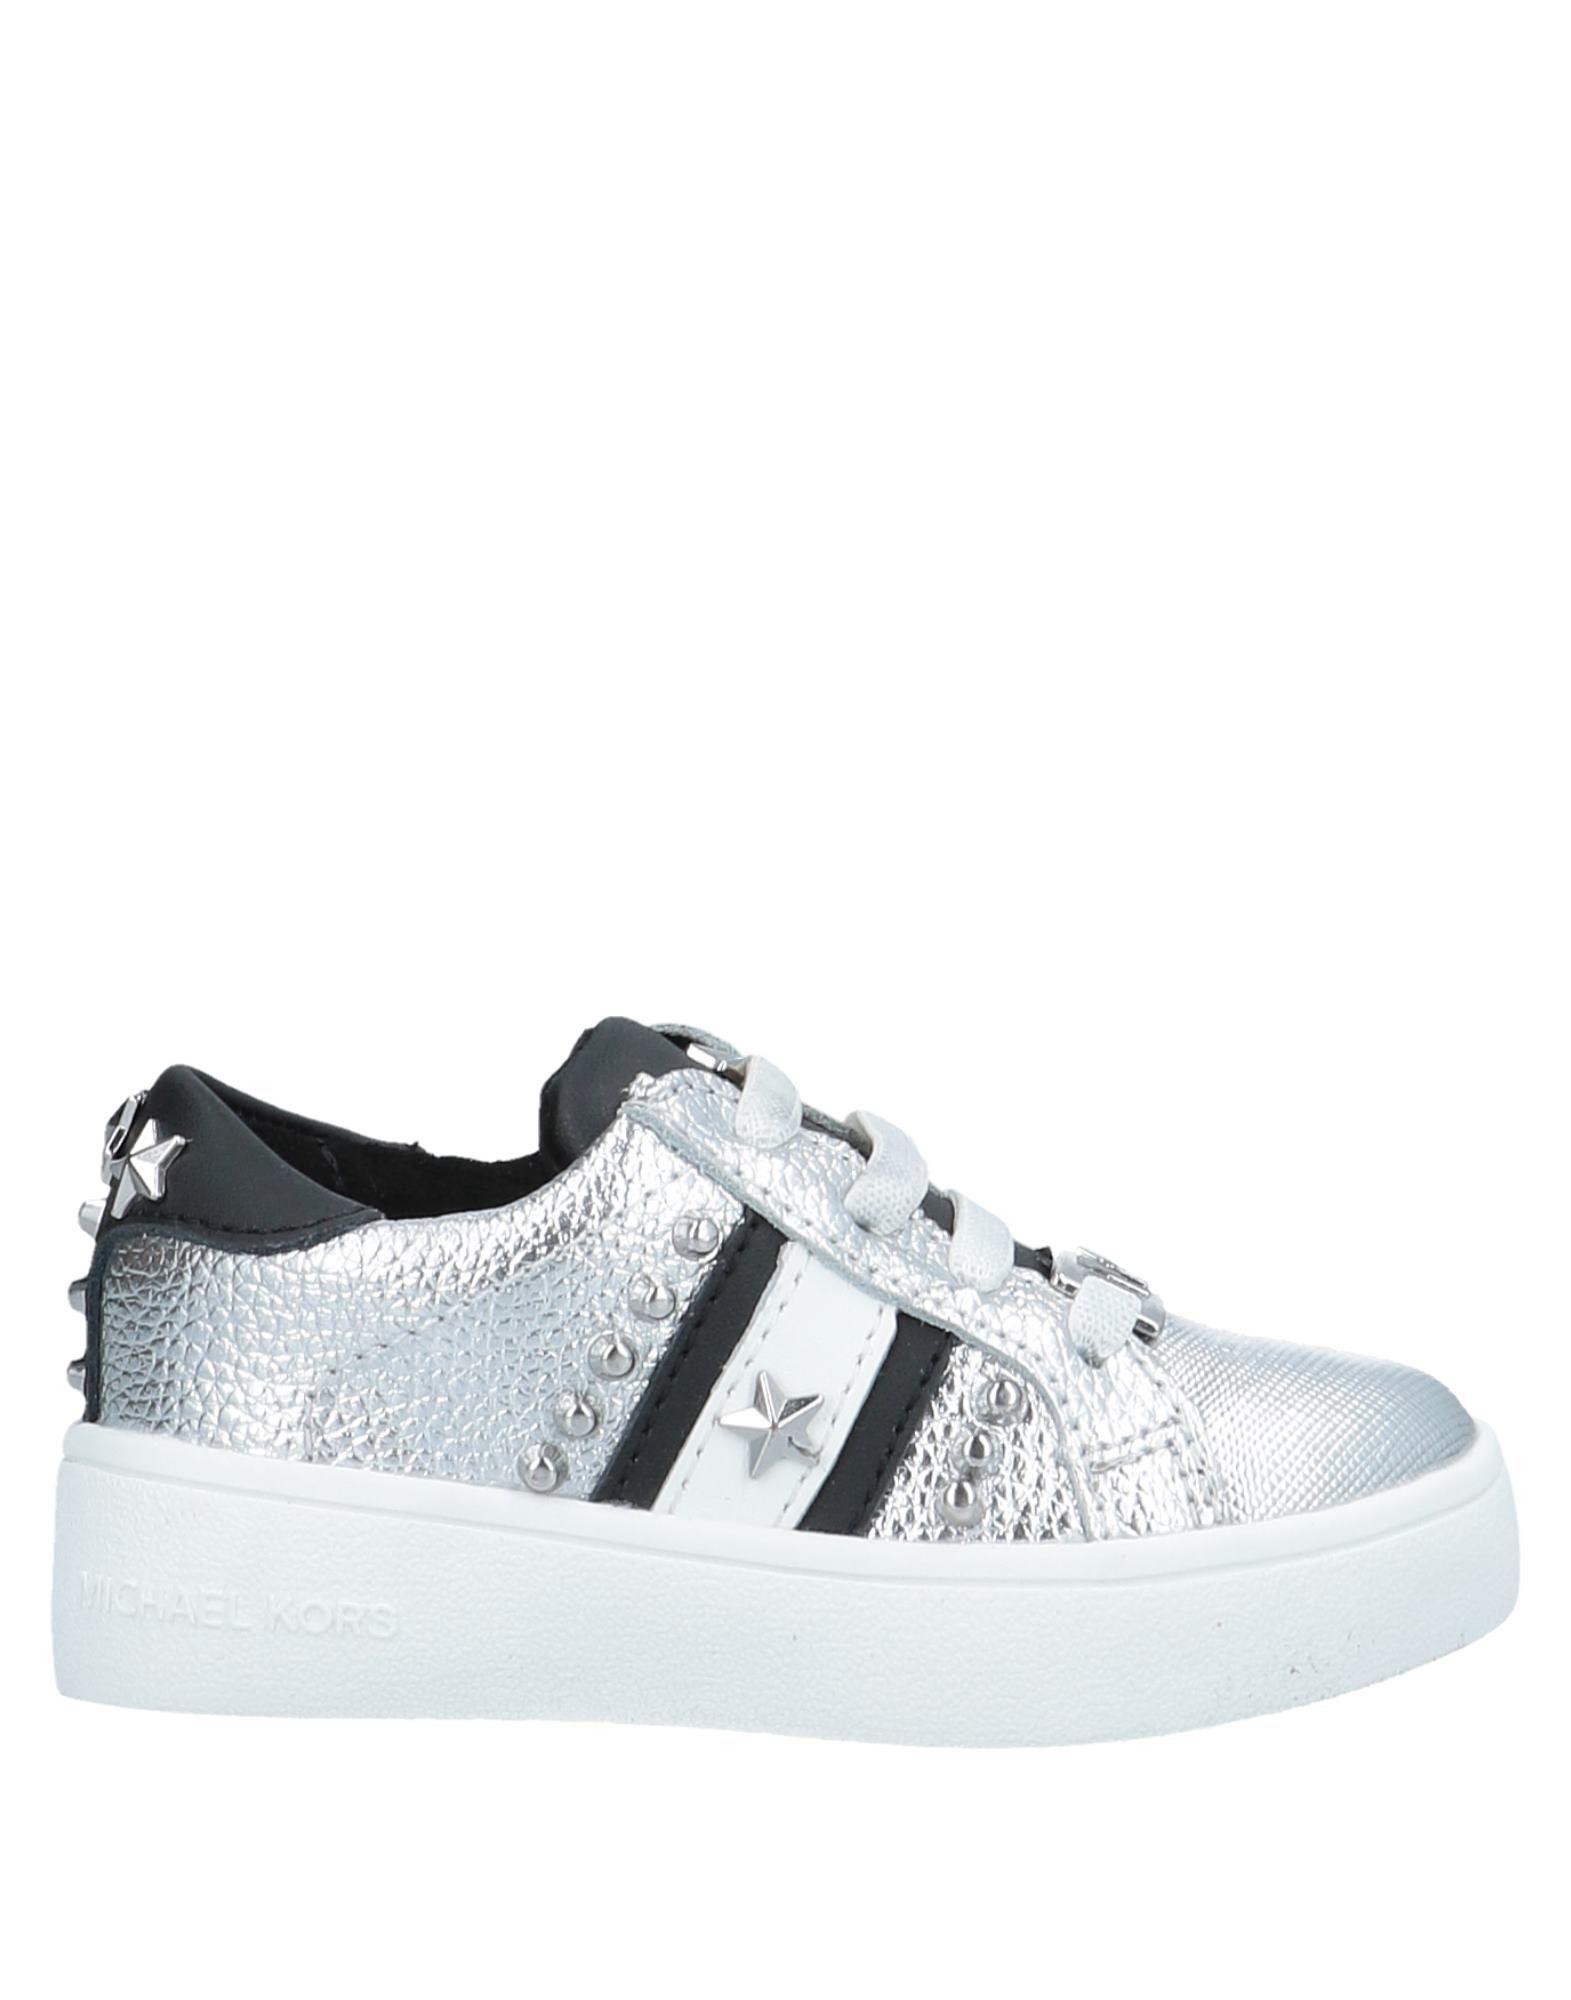 67f0fa9c3c5eb1 Michael Michael Kors Sneakers Girl 0-24 months online on YOOX ...